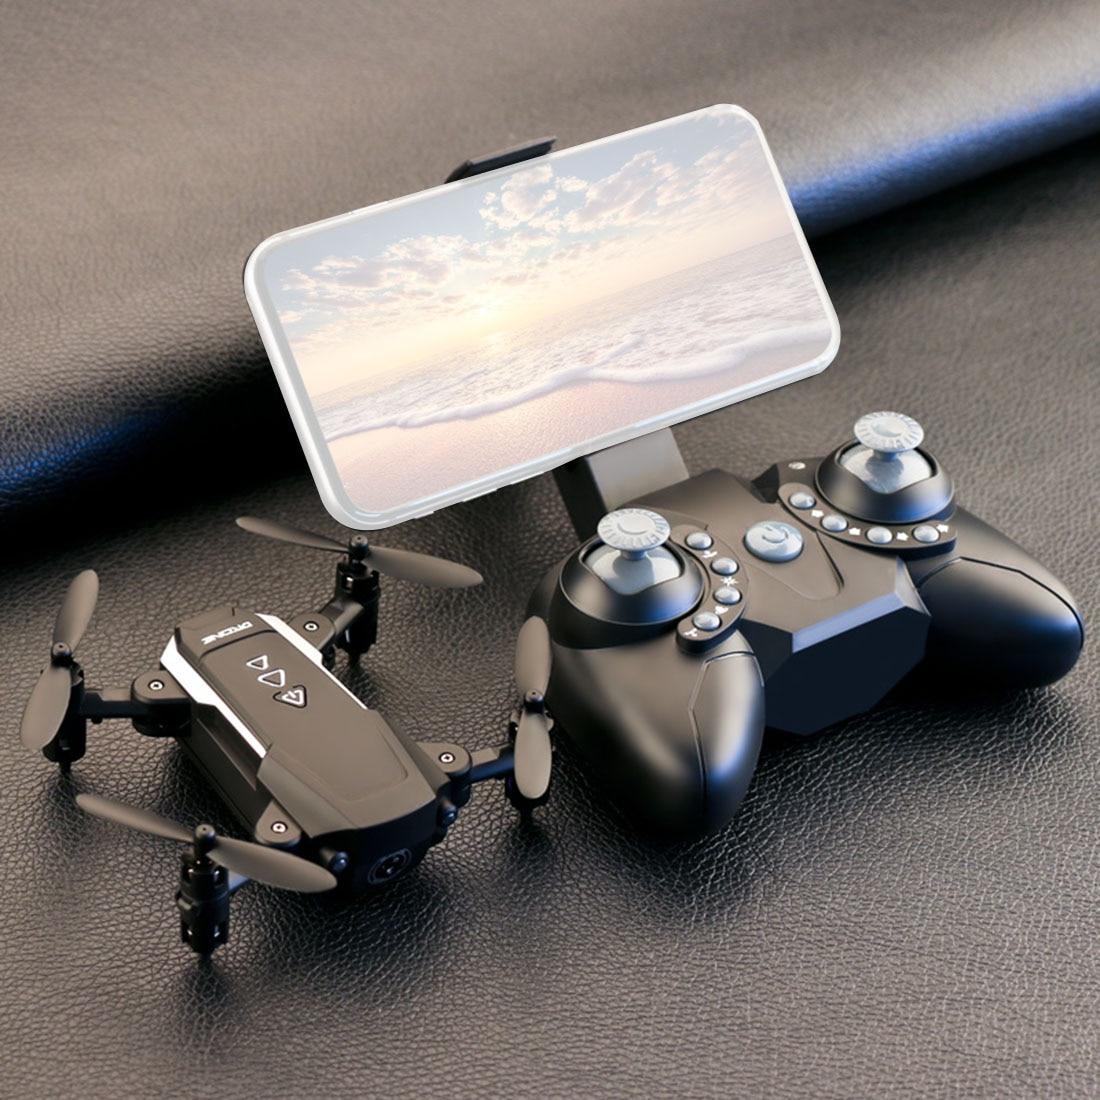 Kk8 foldable 미니 드론 드론 rc fpv quadcopter hd 카메라 wifi fpv dron selfie rc 헬리콥터 juguetes toys нвадроеоптер-에서RC 헬리콥터부터 완구 & 취미 의